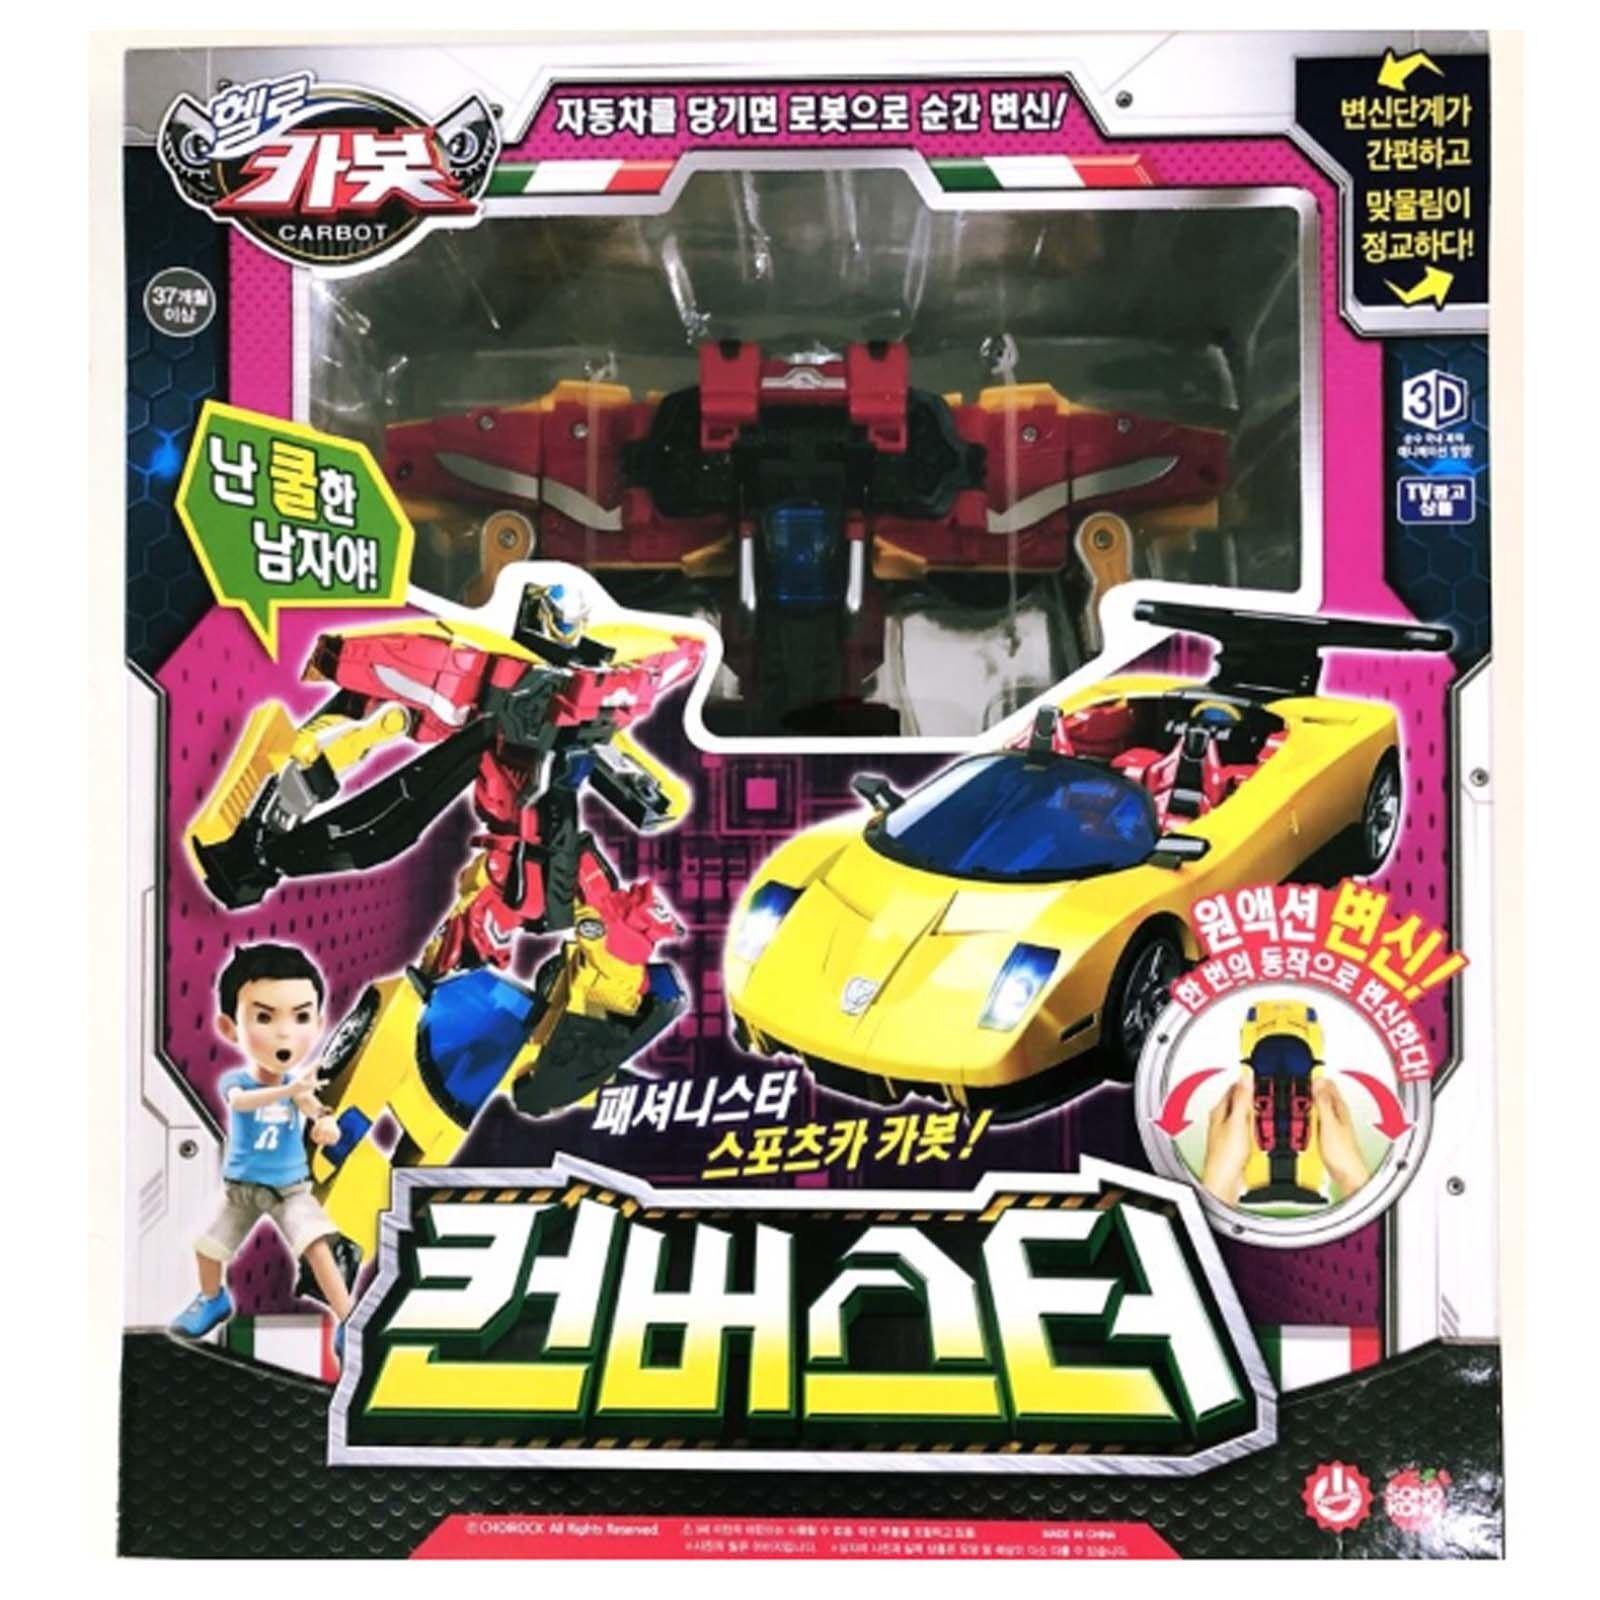 Hello Carbot Converster Transformer Robot Cogreenible Car Toy